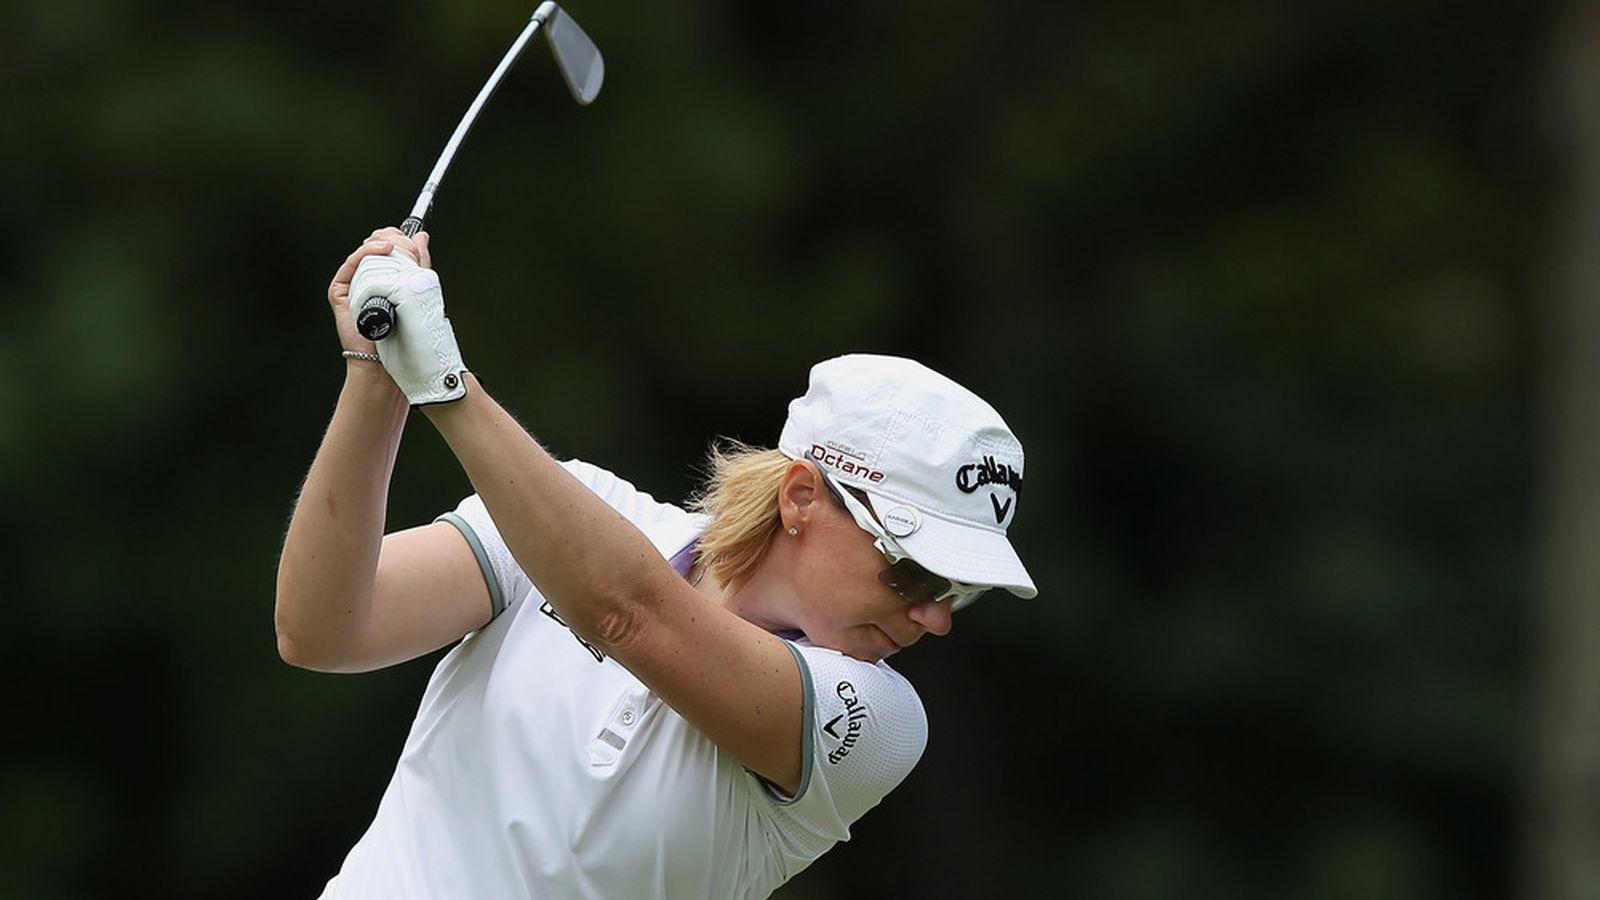 Annika Sorenstam makes golf history at Colonial: A 10-year